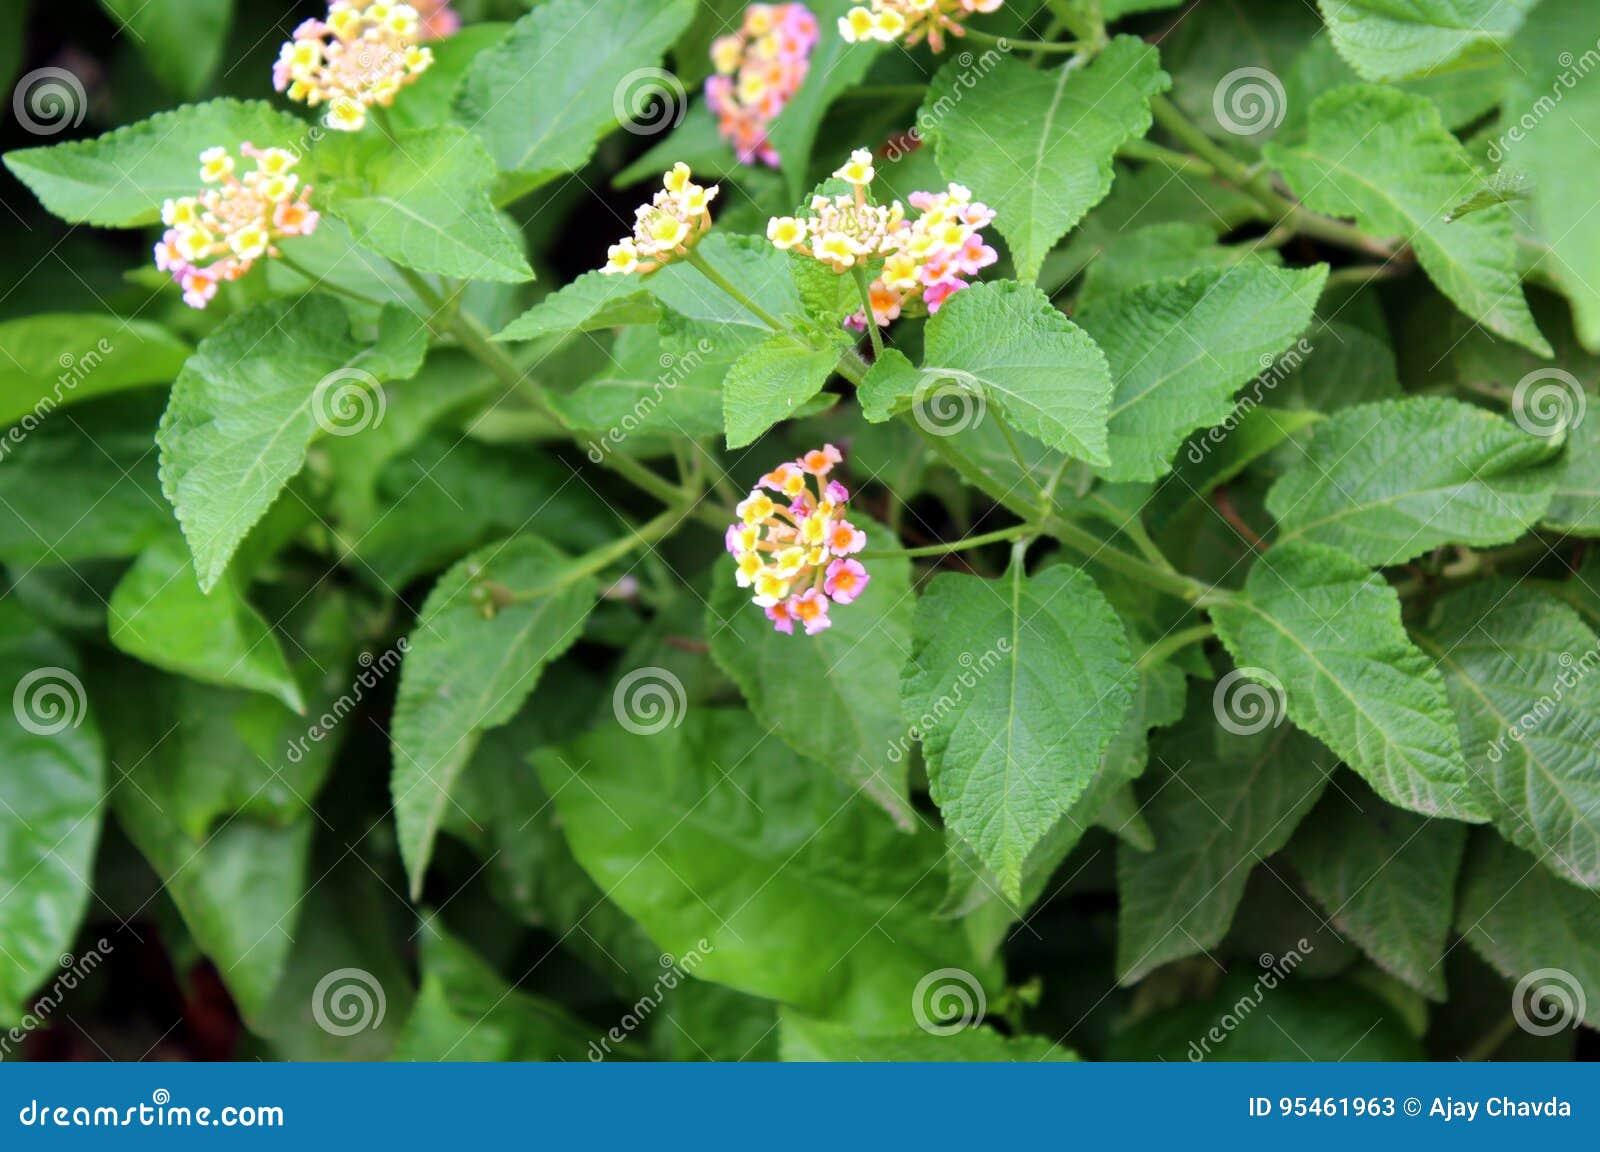 Yellow Foliage And Green Leaf Plant Beautiful Flower On Green Leaf